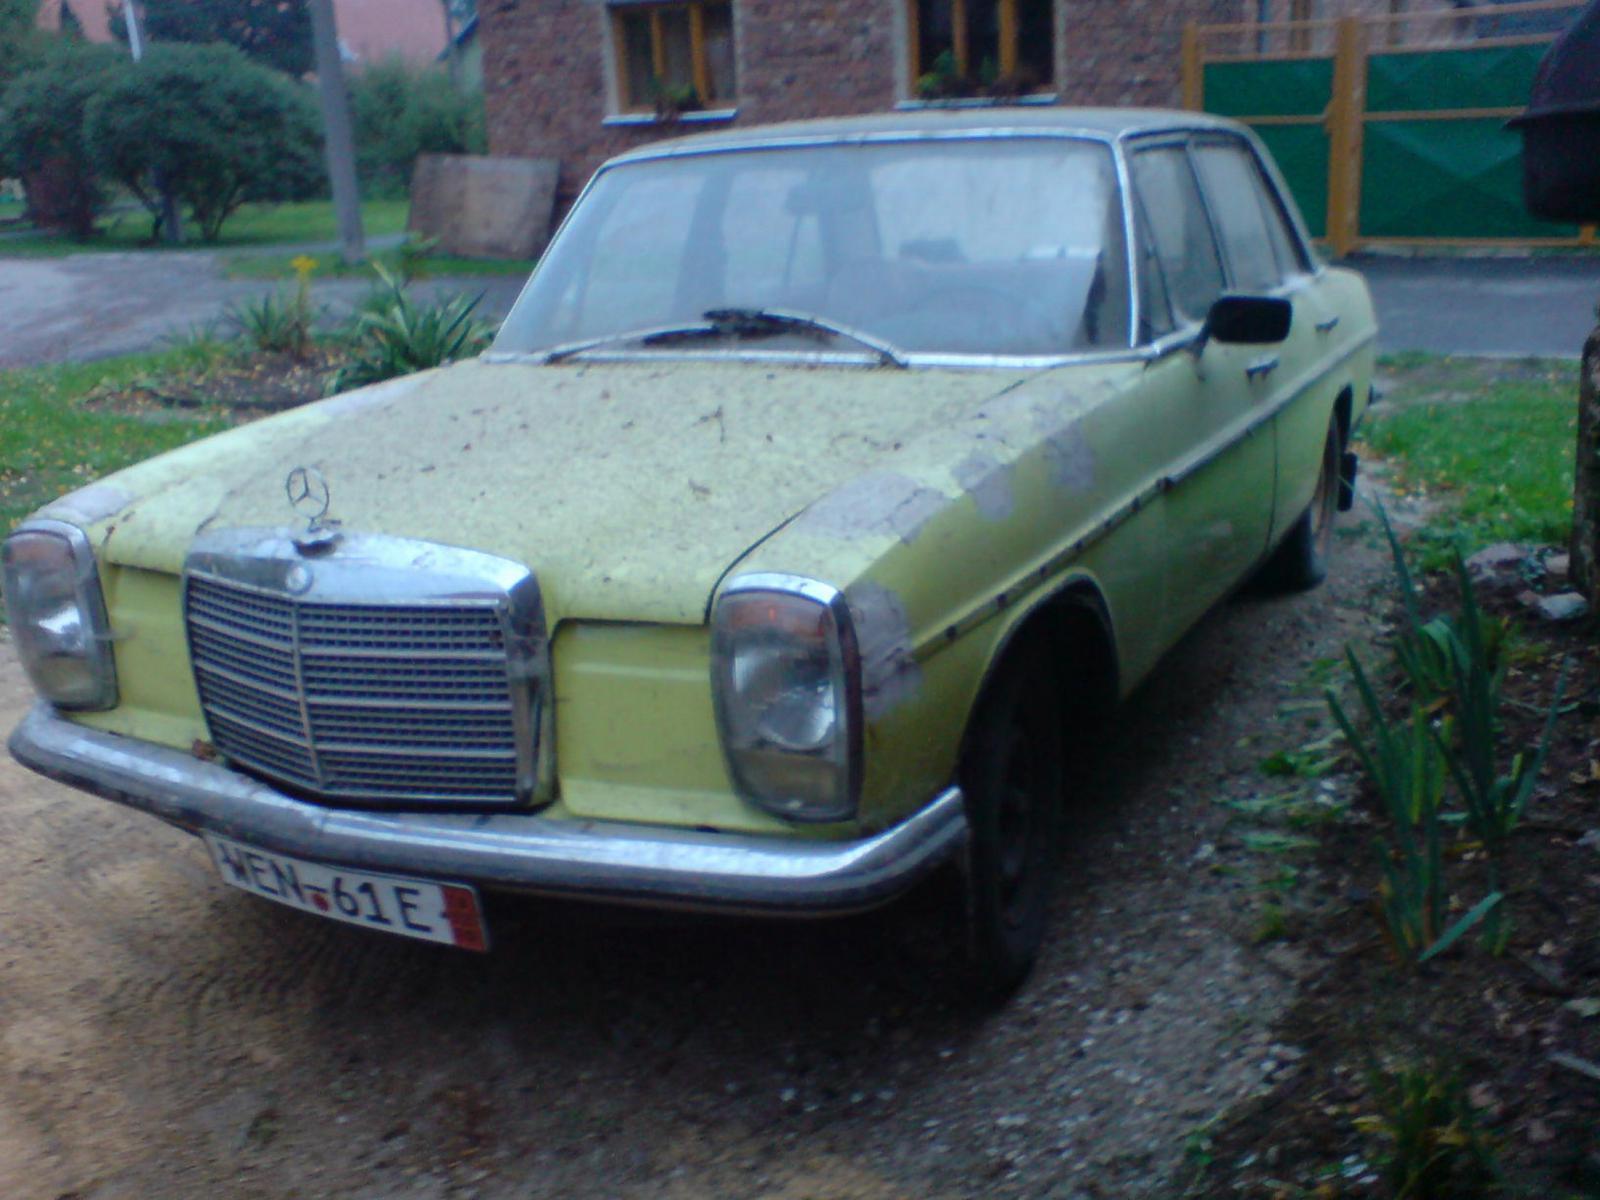 1970 Mercedes Benz W114/115 W